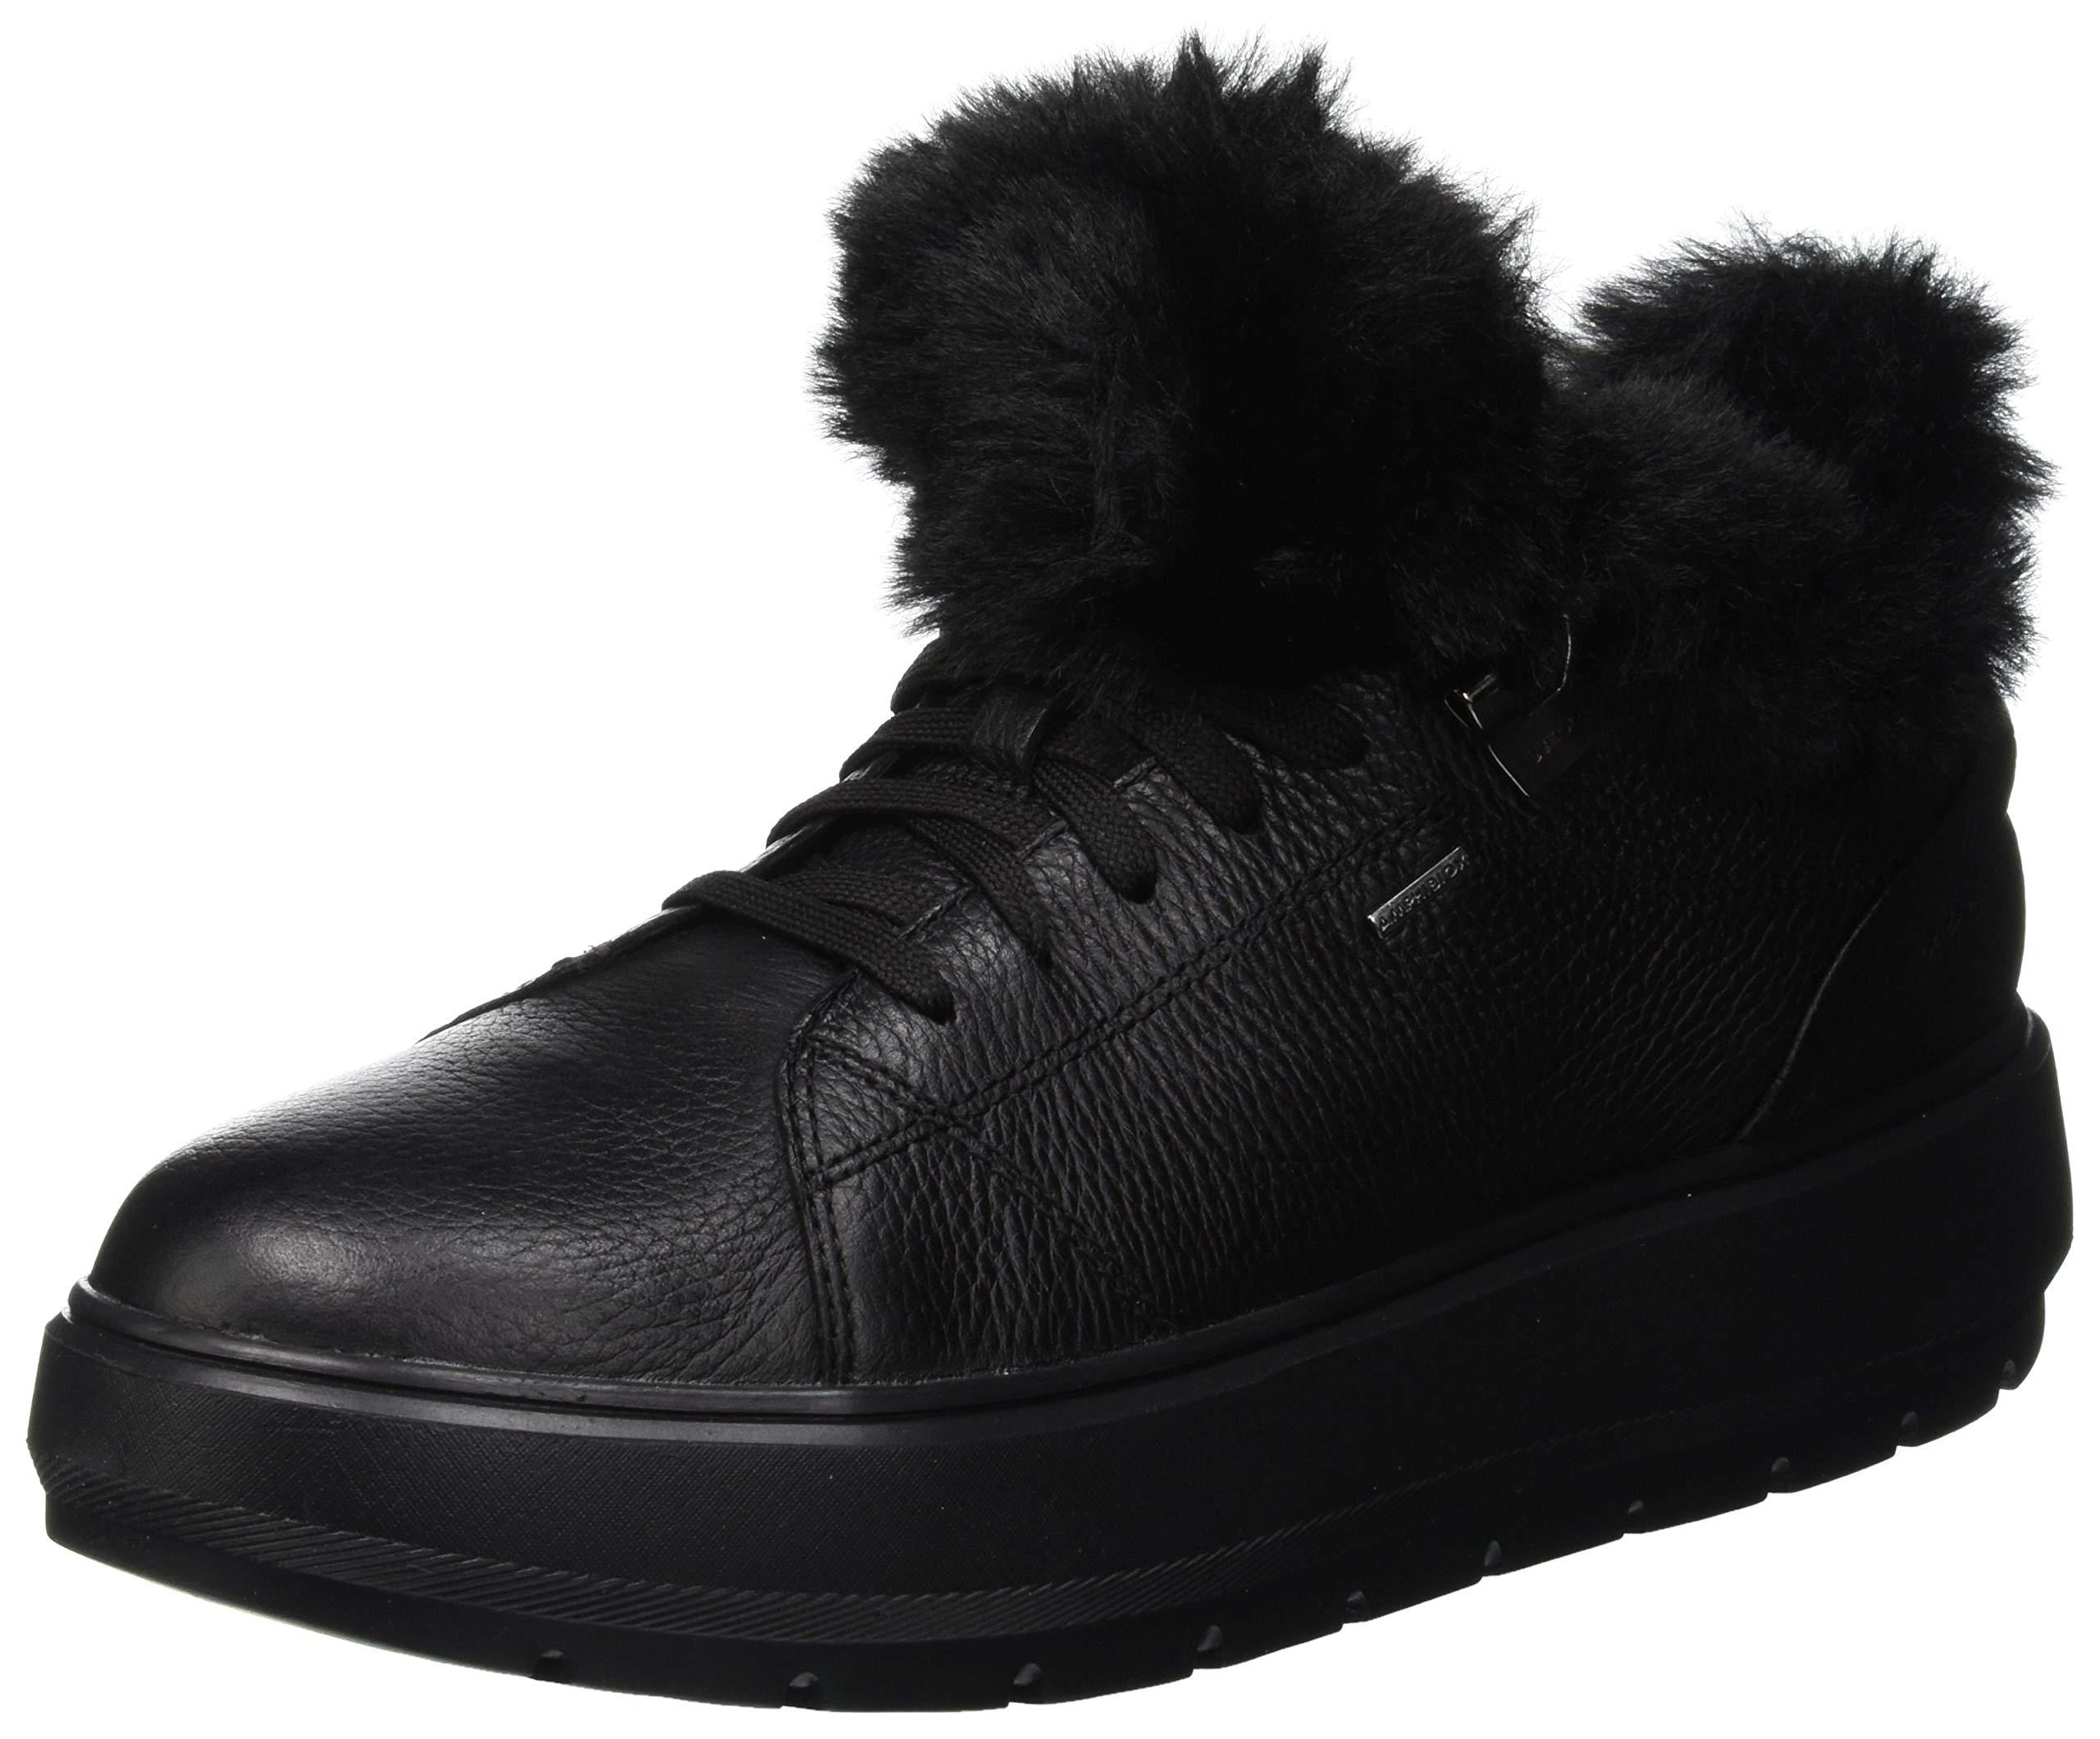 Cabra Seguir Dormitorio  Geox Women's D Kaula B ABX a Low-Top Sneakers- Buy Online in Vietnam at  Desertcart. ProductId : 119111962.